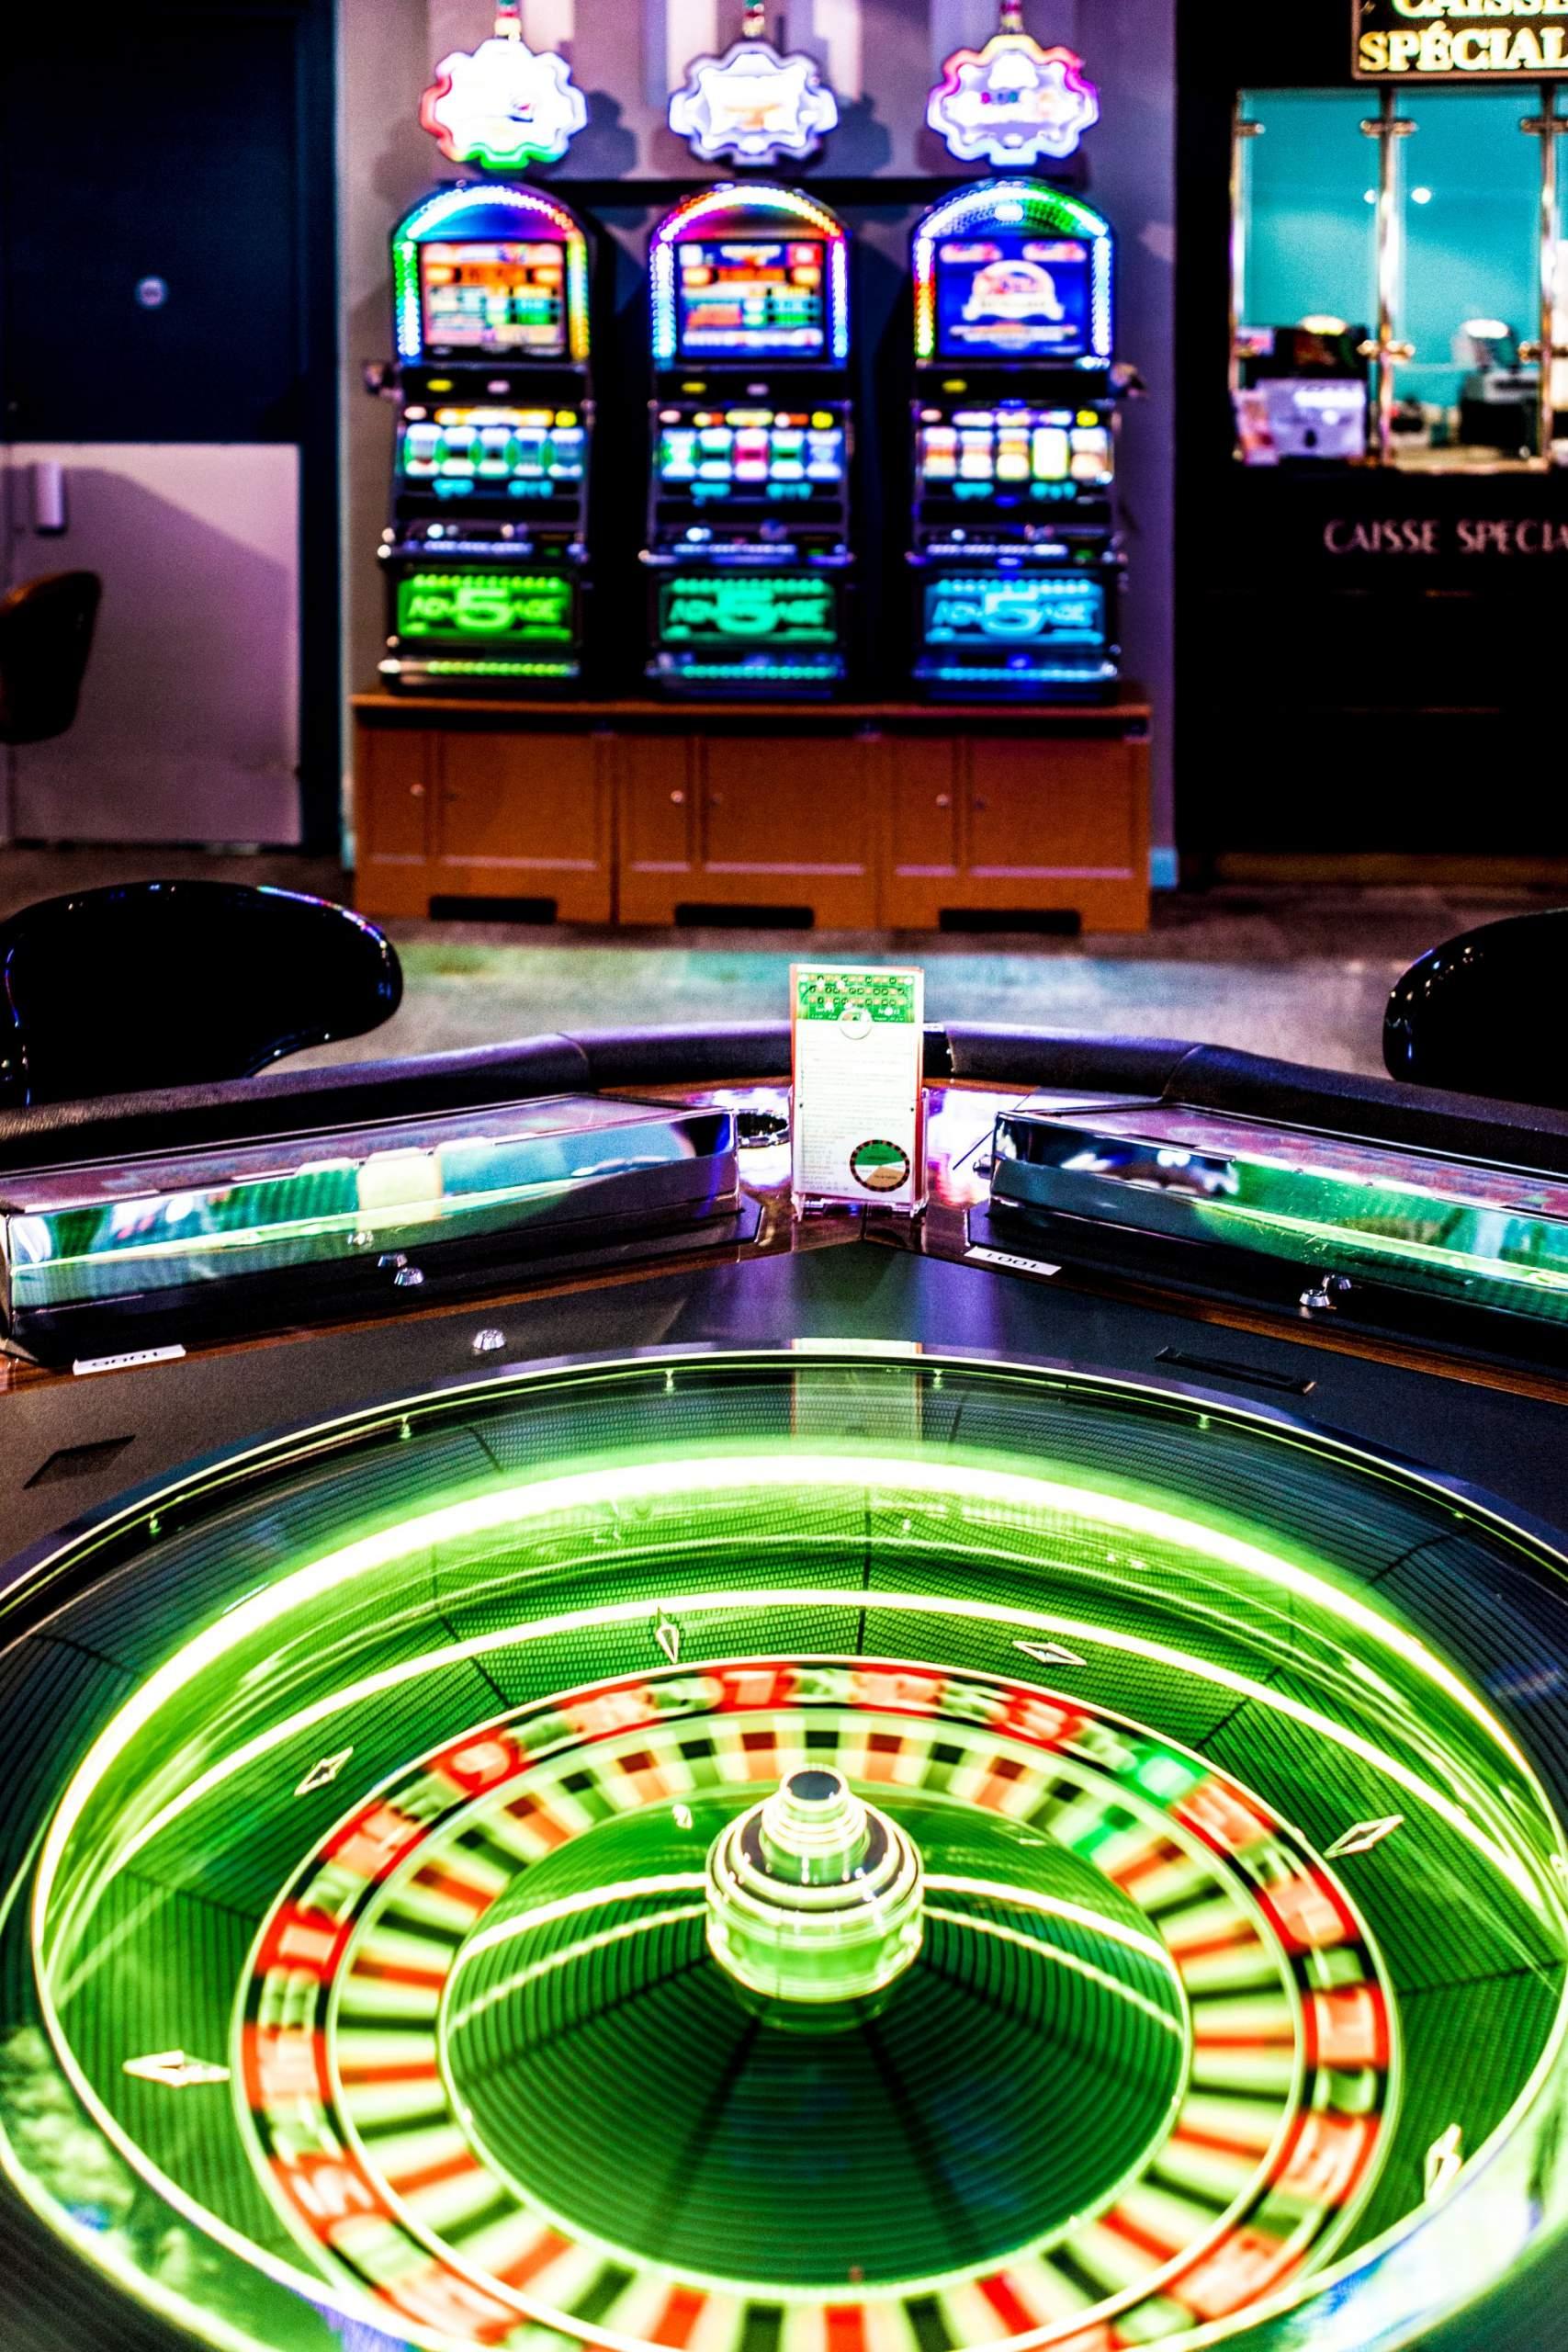 Vals les bains' Casino